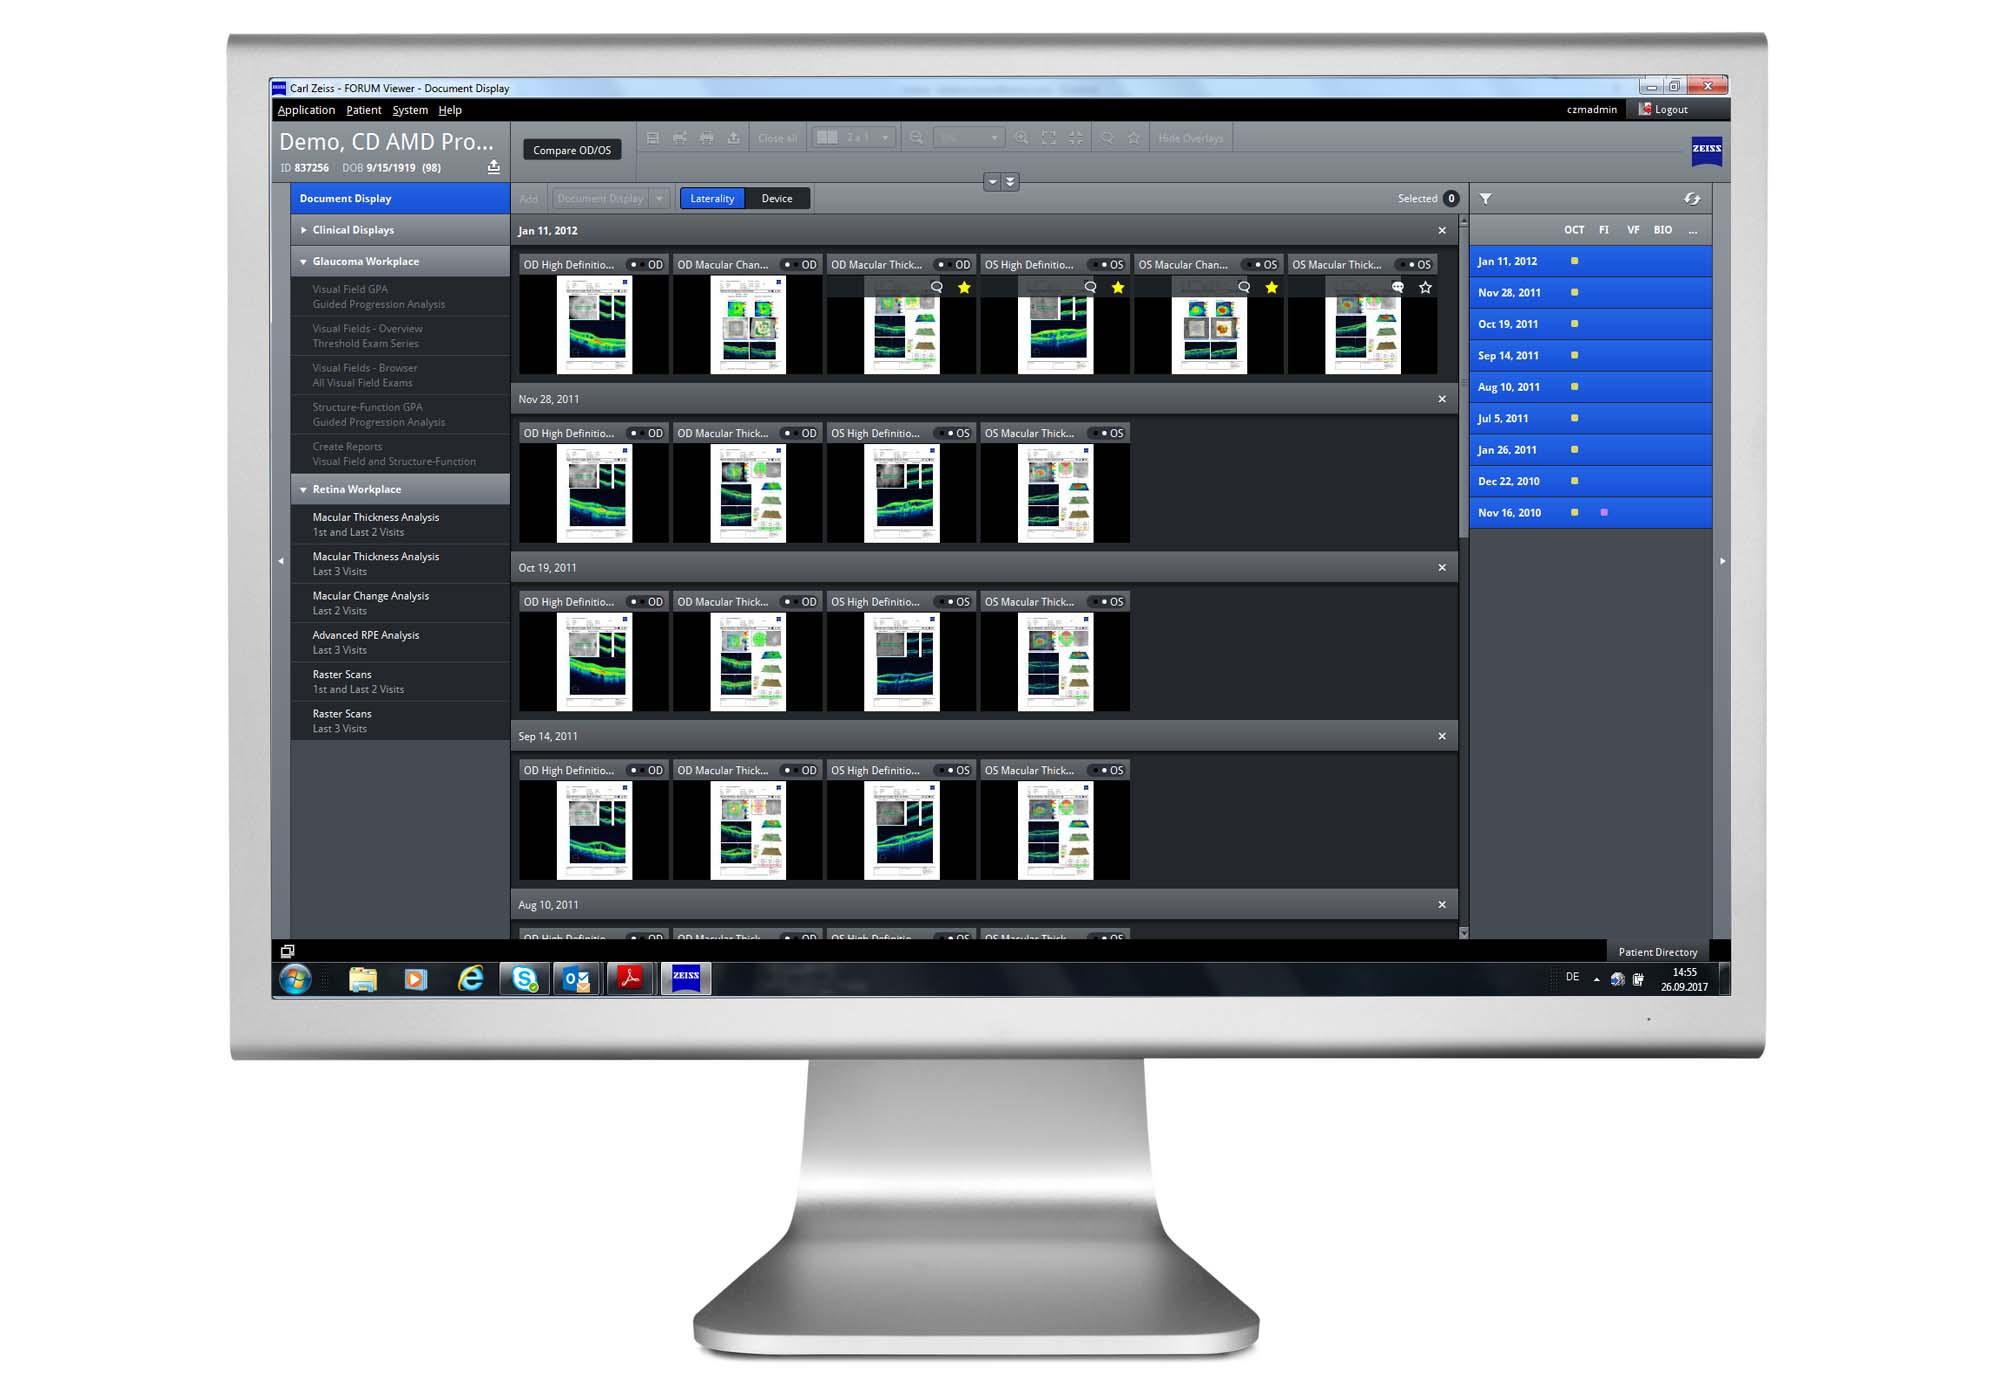 ZEISS FORUM Ophthalmology Software - Medical Technology | ZEISS